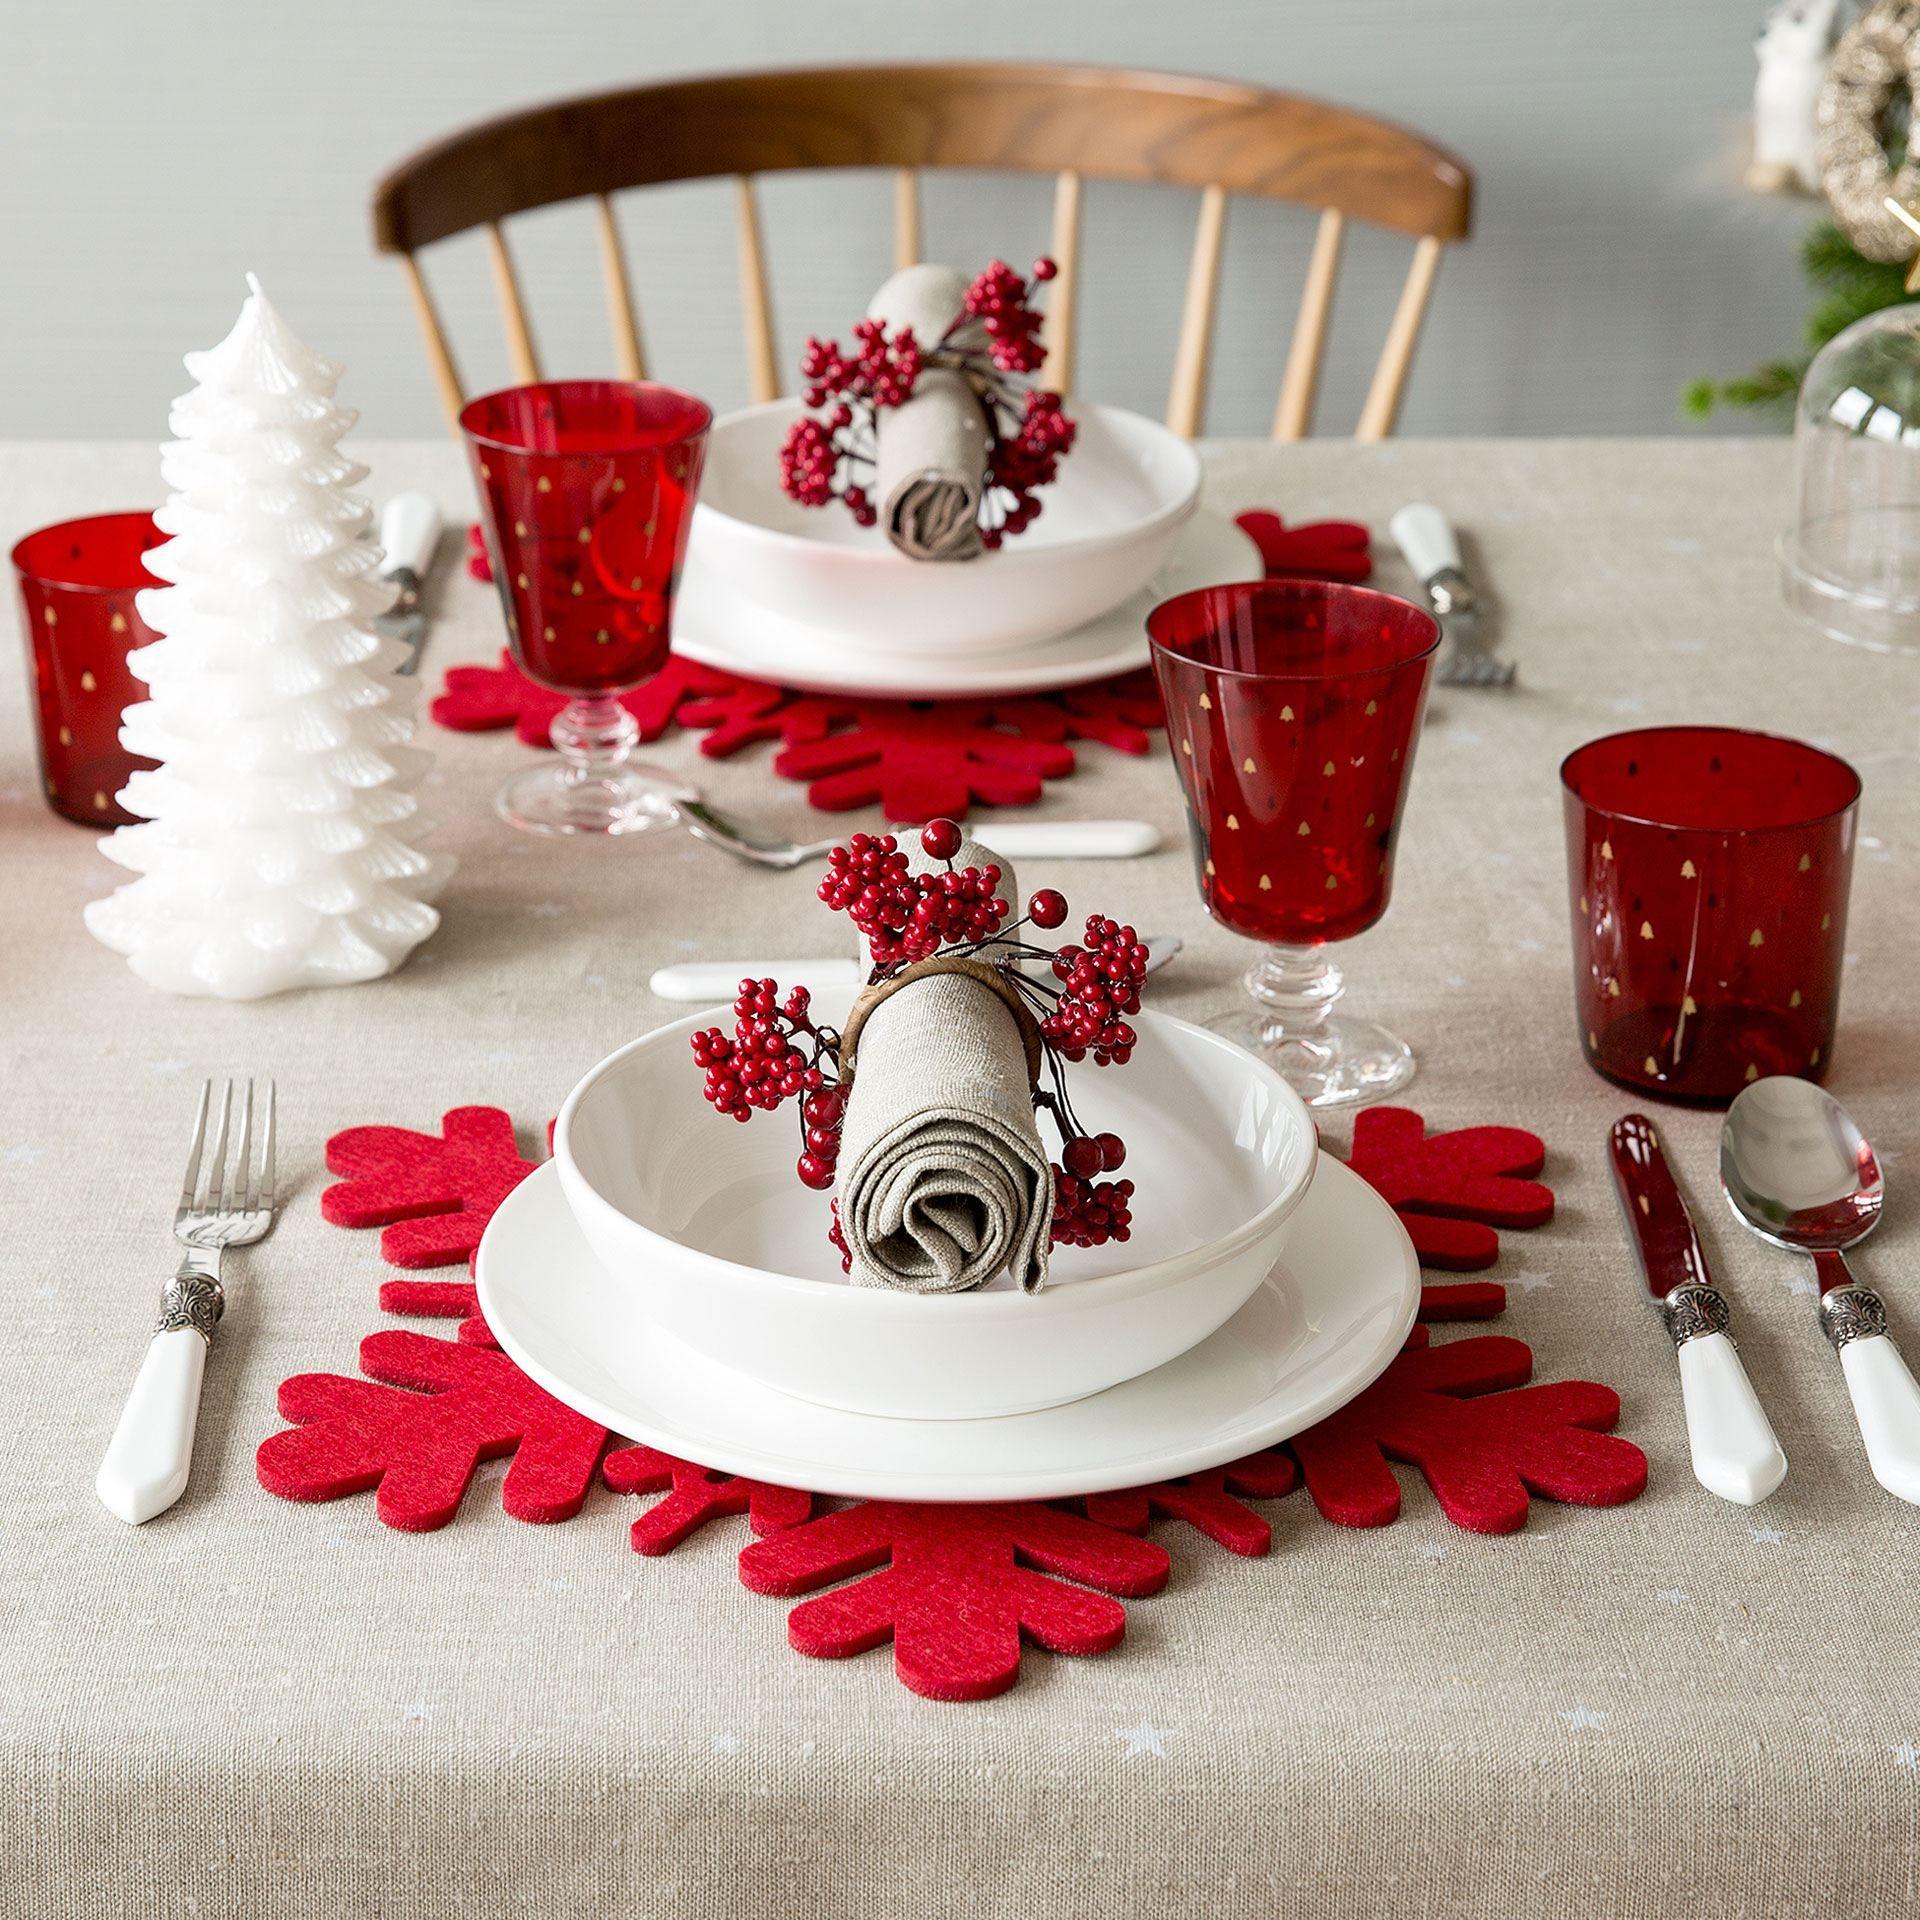 catalogo-zara-home-navidad-2016-decoracion-mesa-roja-individual-copo ...